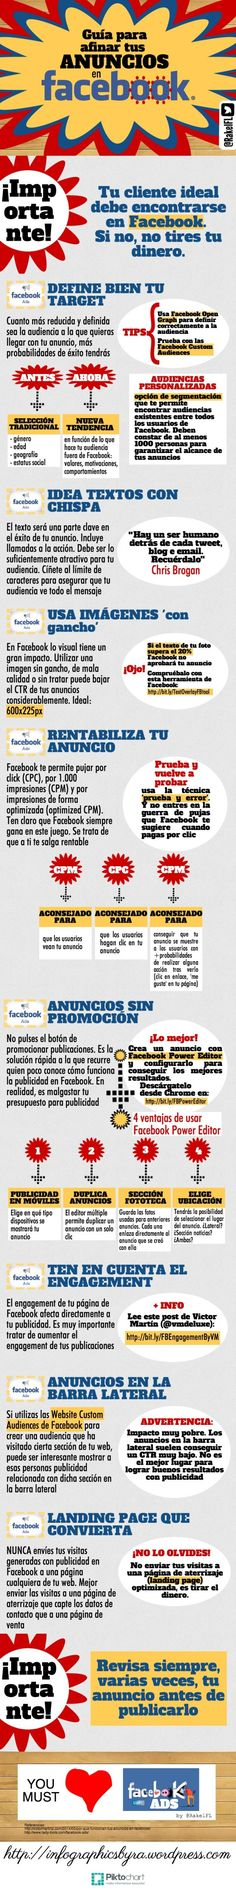 Infografía Guía de Anuncios Efectivos en Facebook Ads